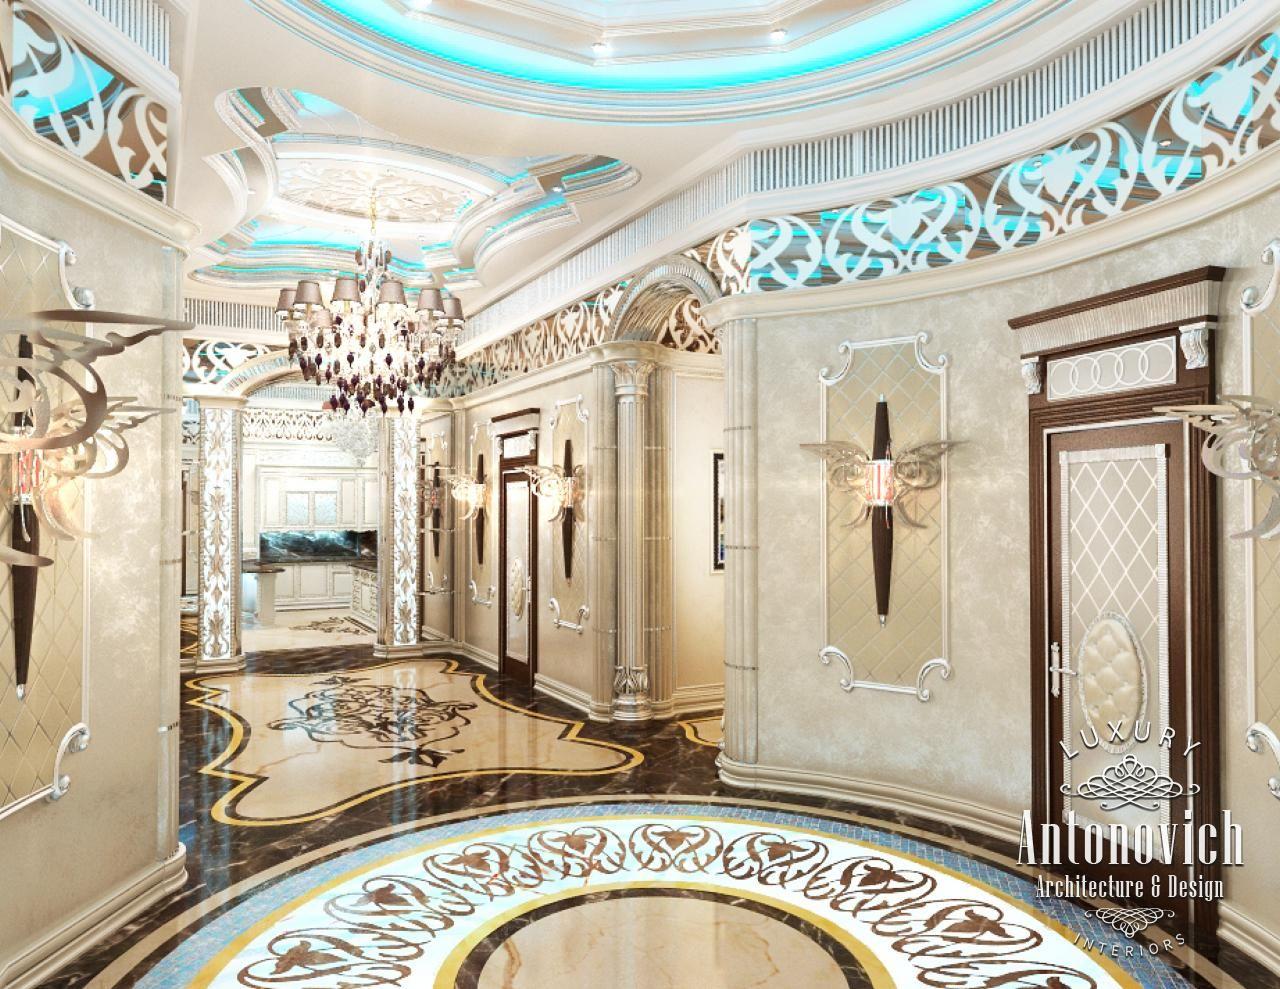 Kitchen Design in Dubai, Kitchen Interior Design in the UAE, Photo 10